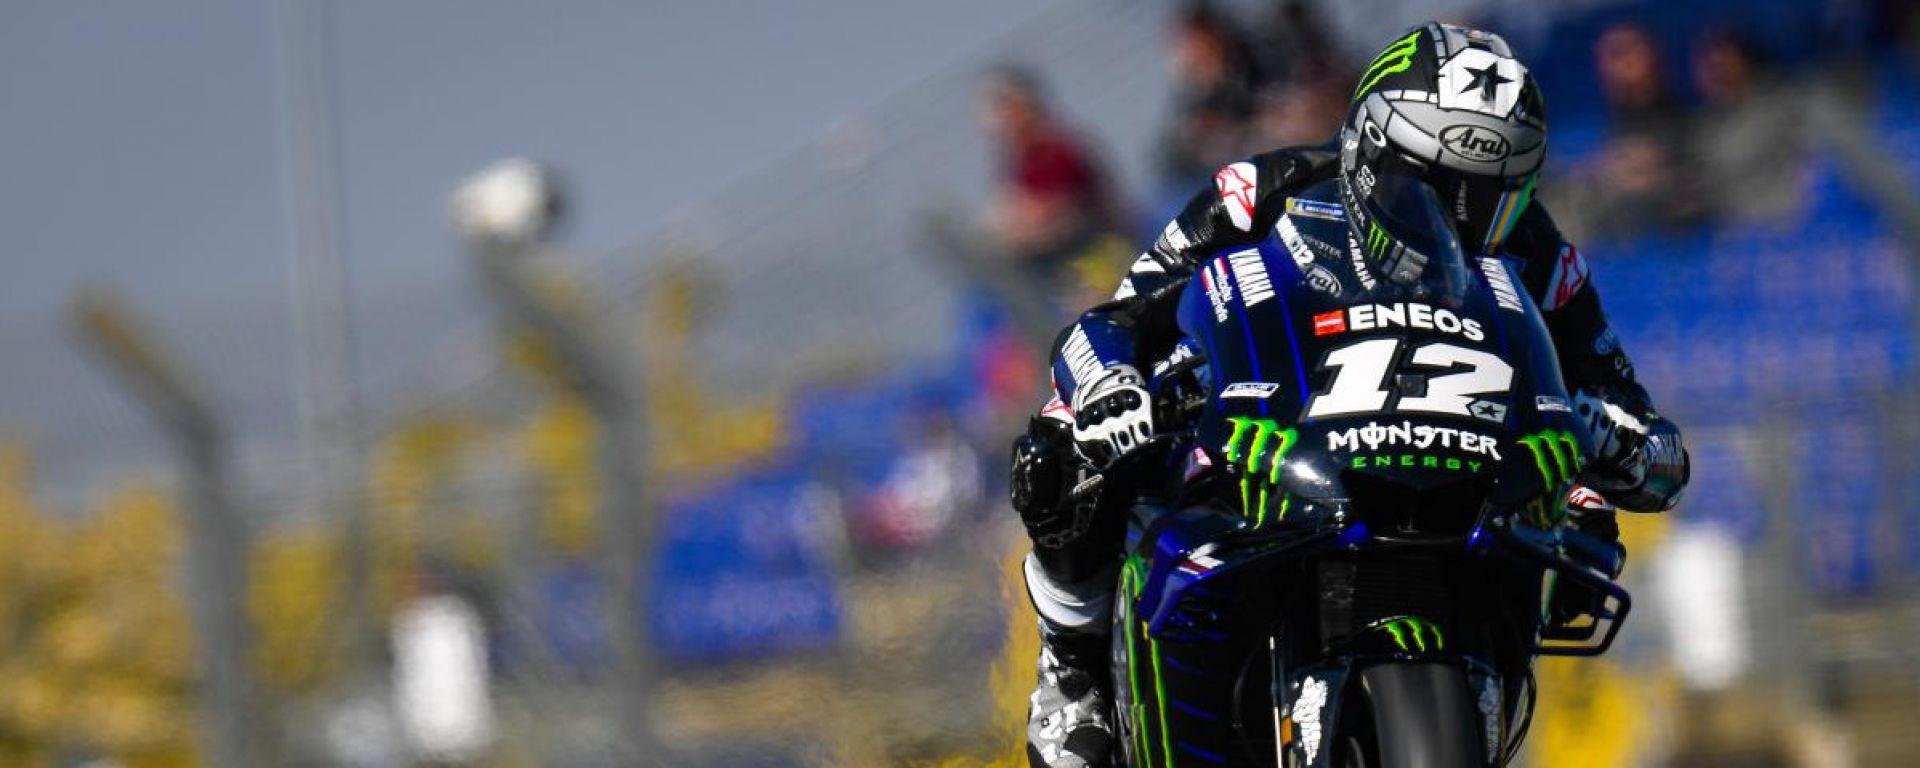 MotoGP Francia 2019, Maverick Vinales chiude le FP2 al comando della classifica